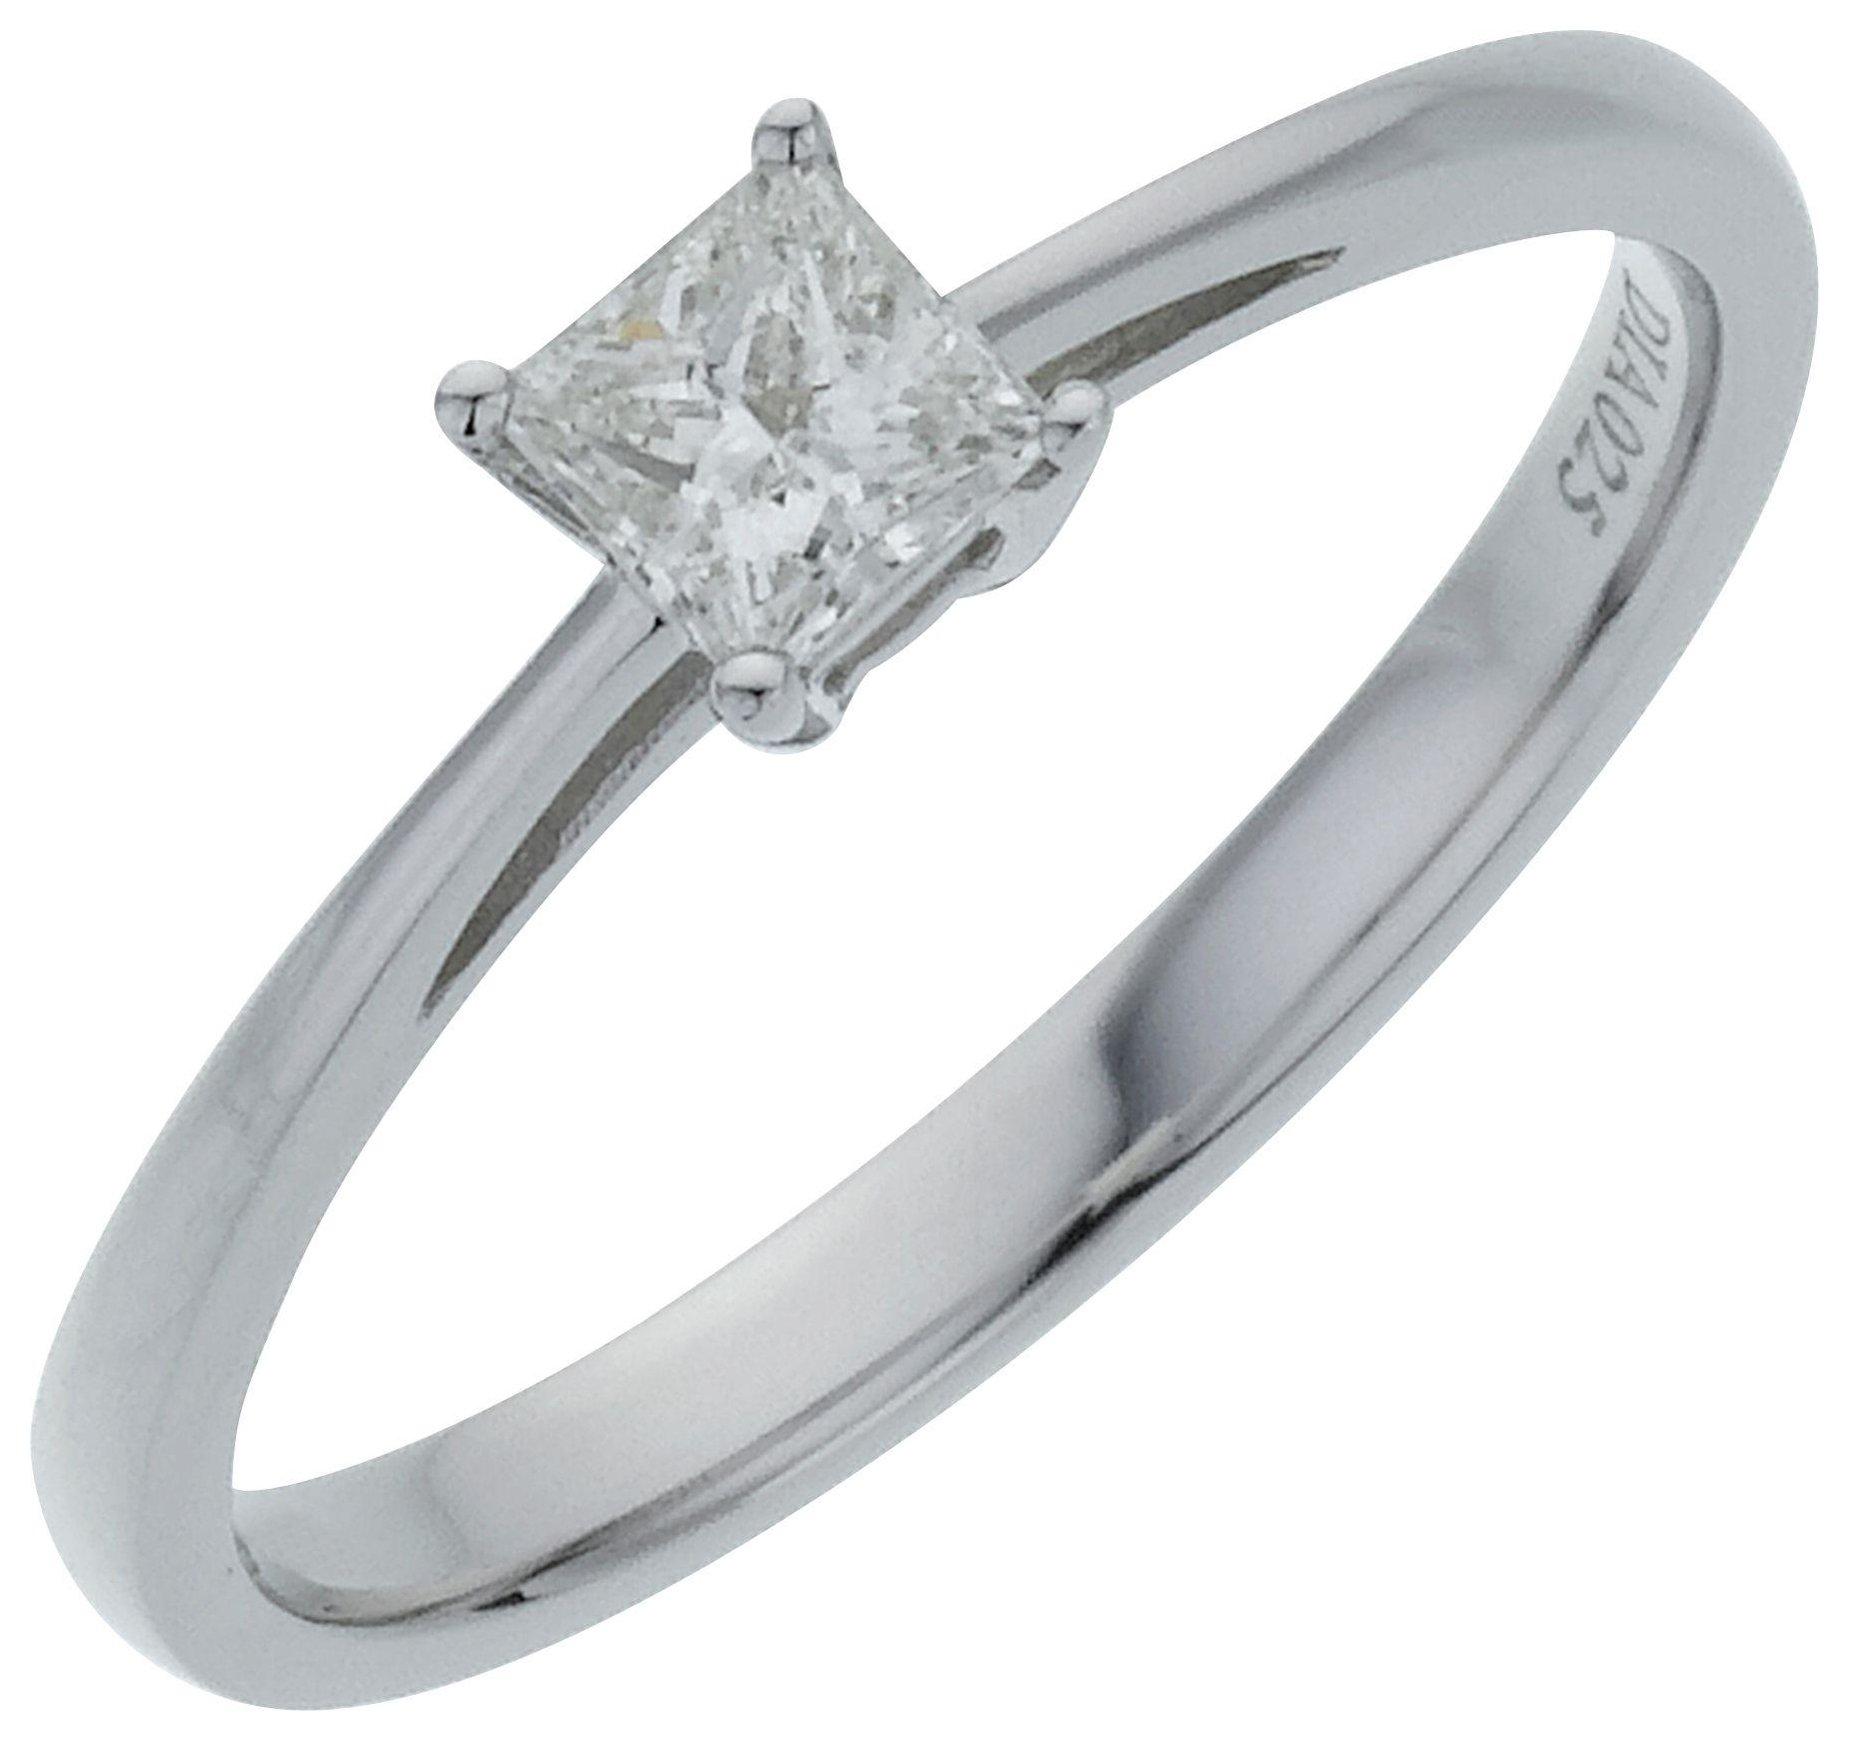 18 Carat White Gold 025 Carat Diamond - Princess Cut Diamond - Ring - S